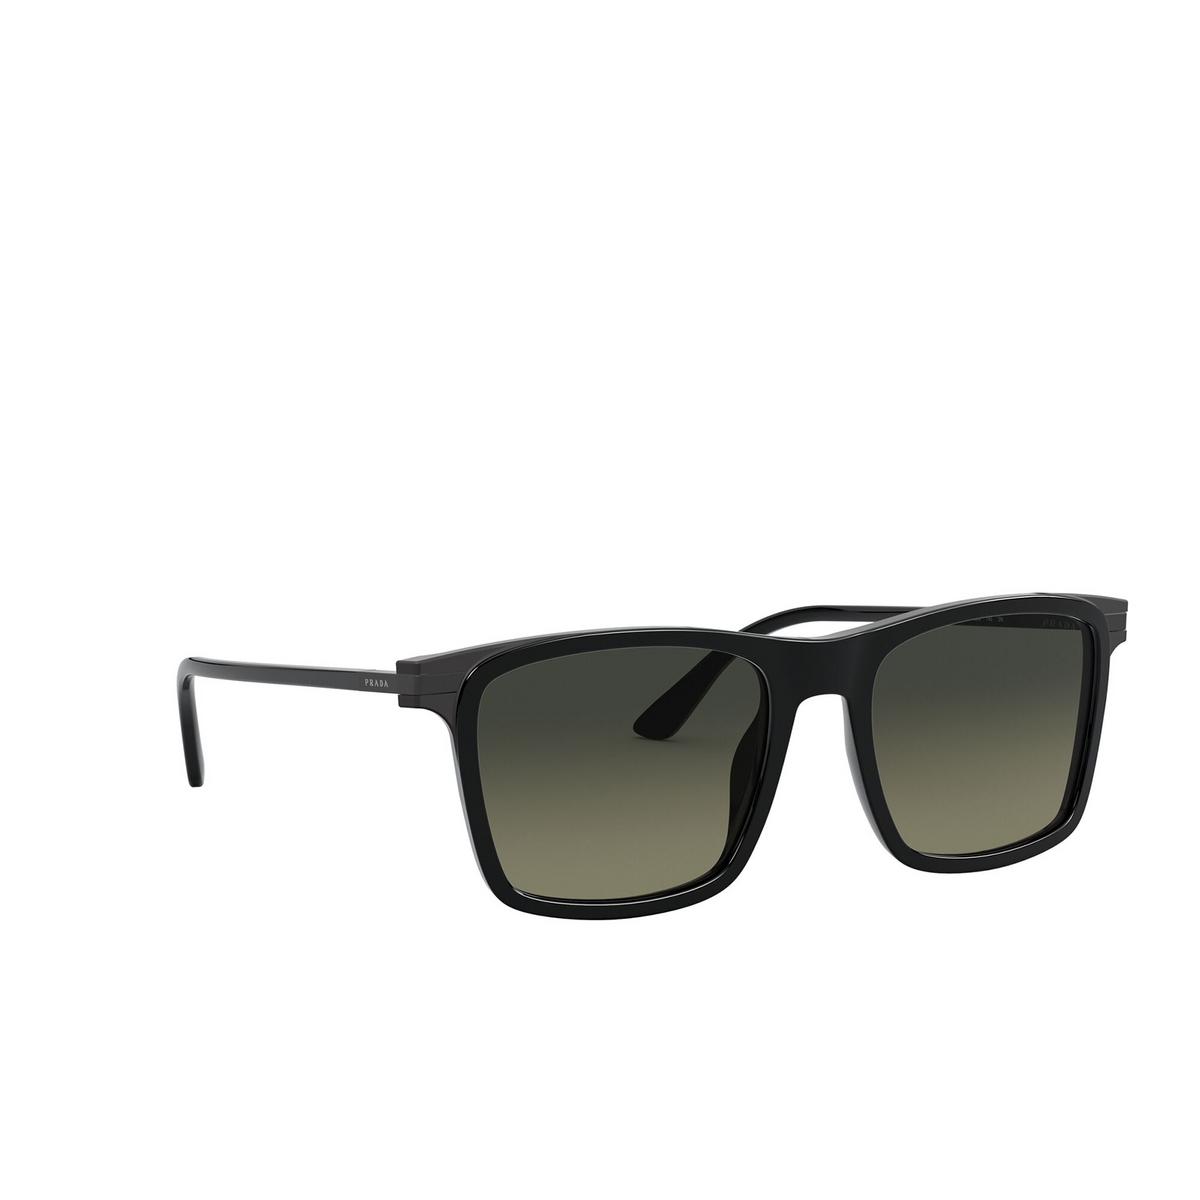 Prada® Square Sunglasses: PR 19XS color Black 07F09G - three-quarters view.